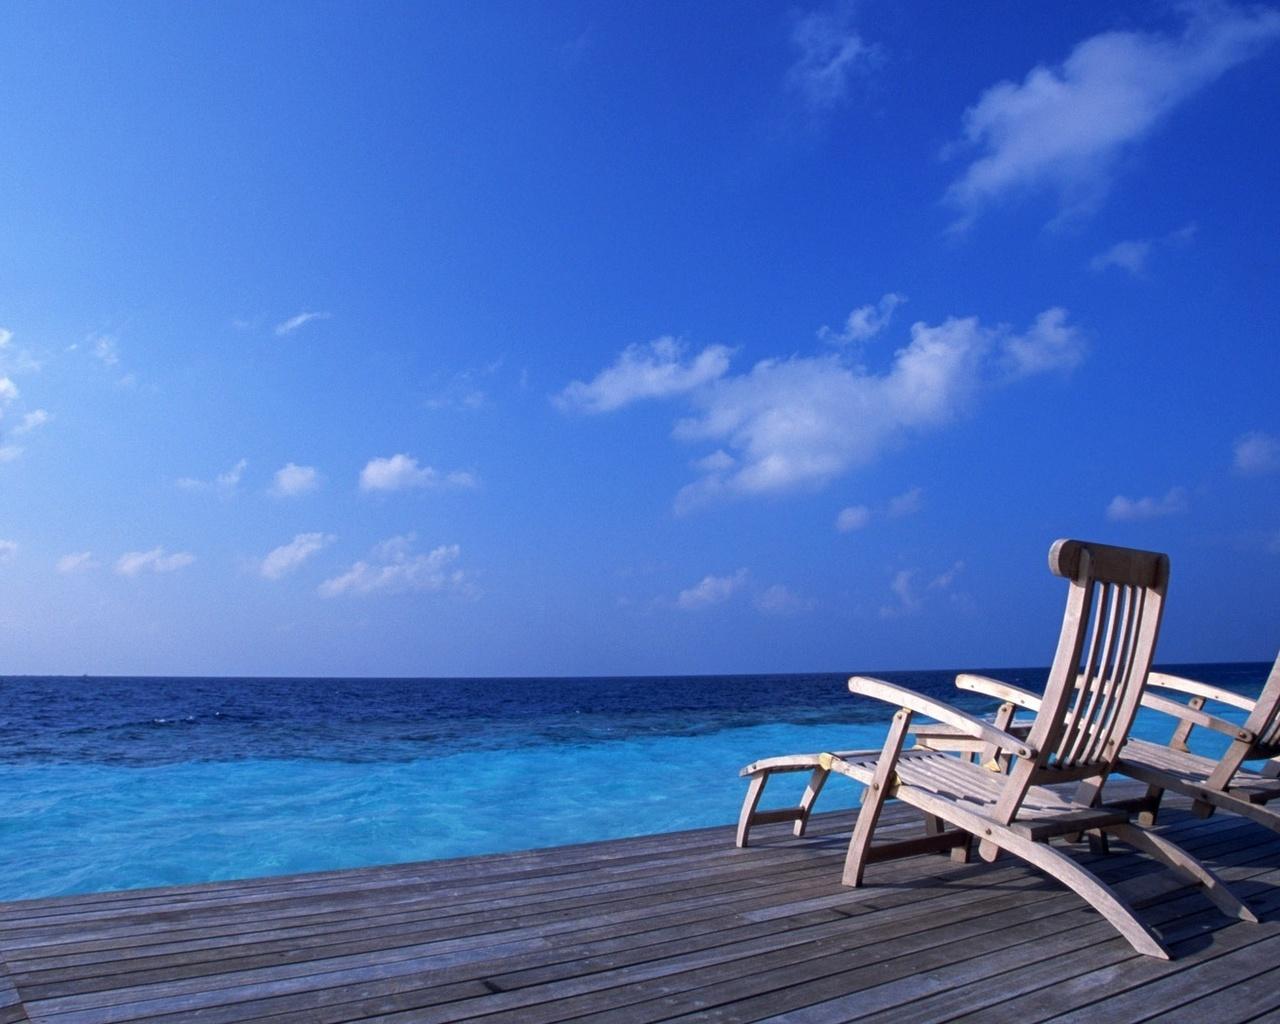 причал, лежаки, пустота, море, синева